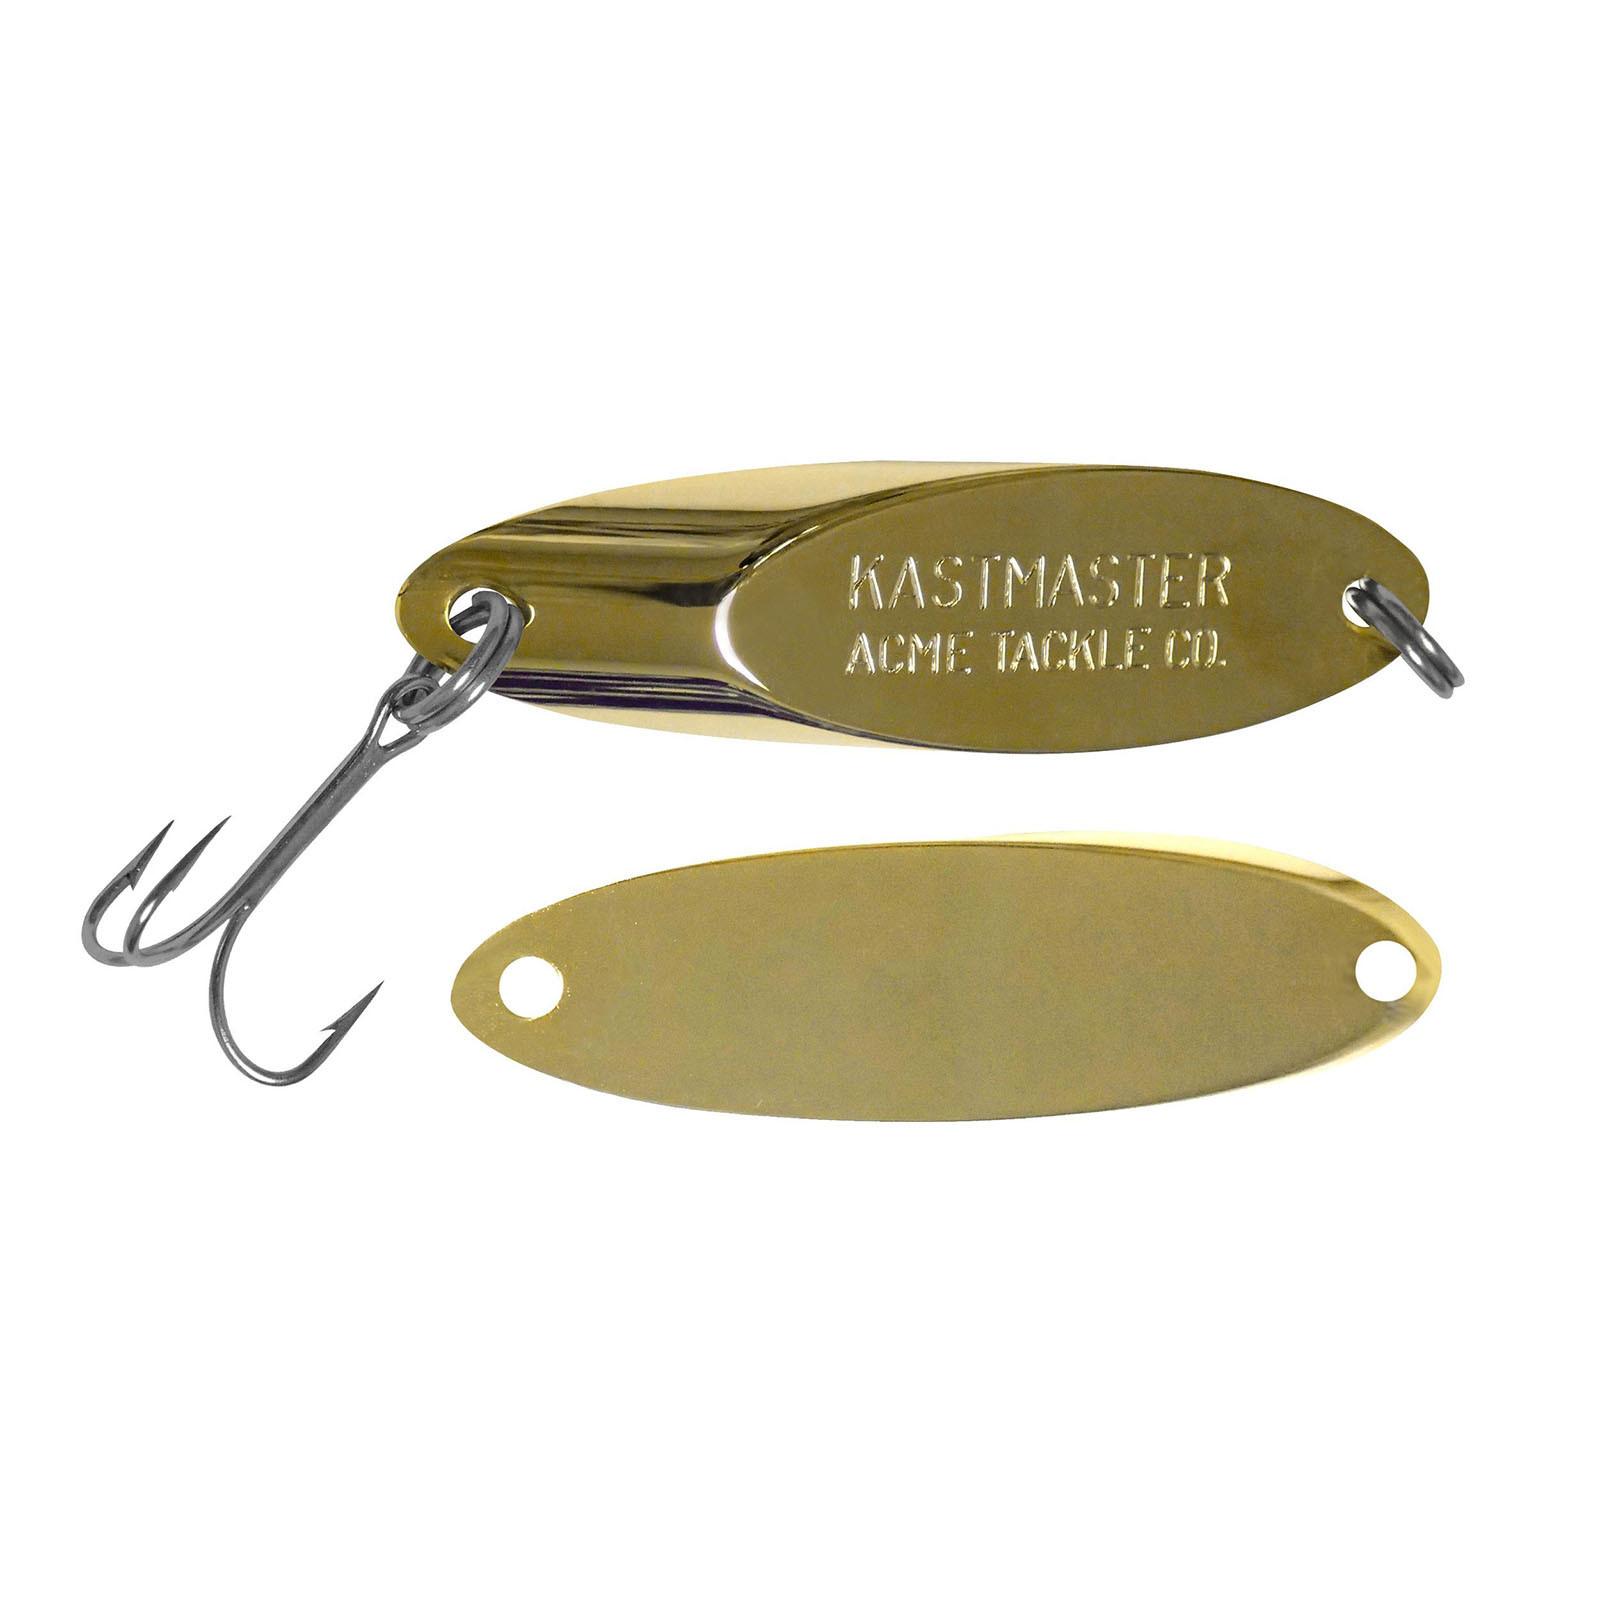 Acme Tackle Company Kastmaster Spoon thumbnail